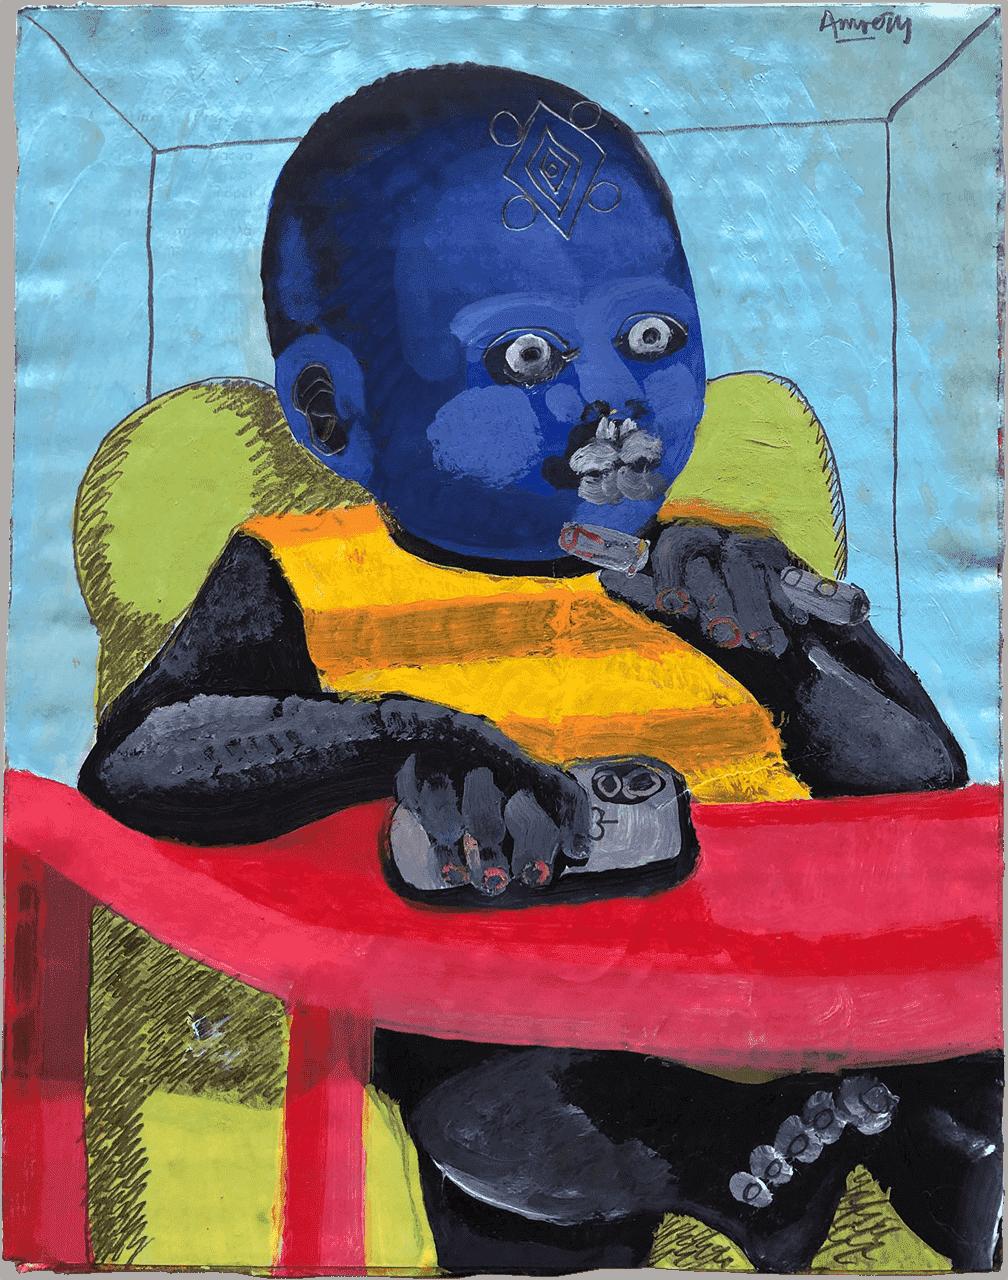 Stop procrastinating and get to work you Big Baby, ακρυλικό και μολύβι σε χαρτί, 22Χ17 εκ.